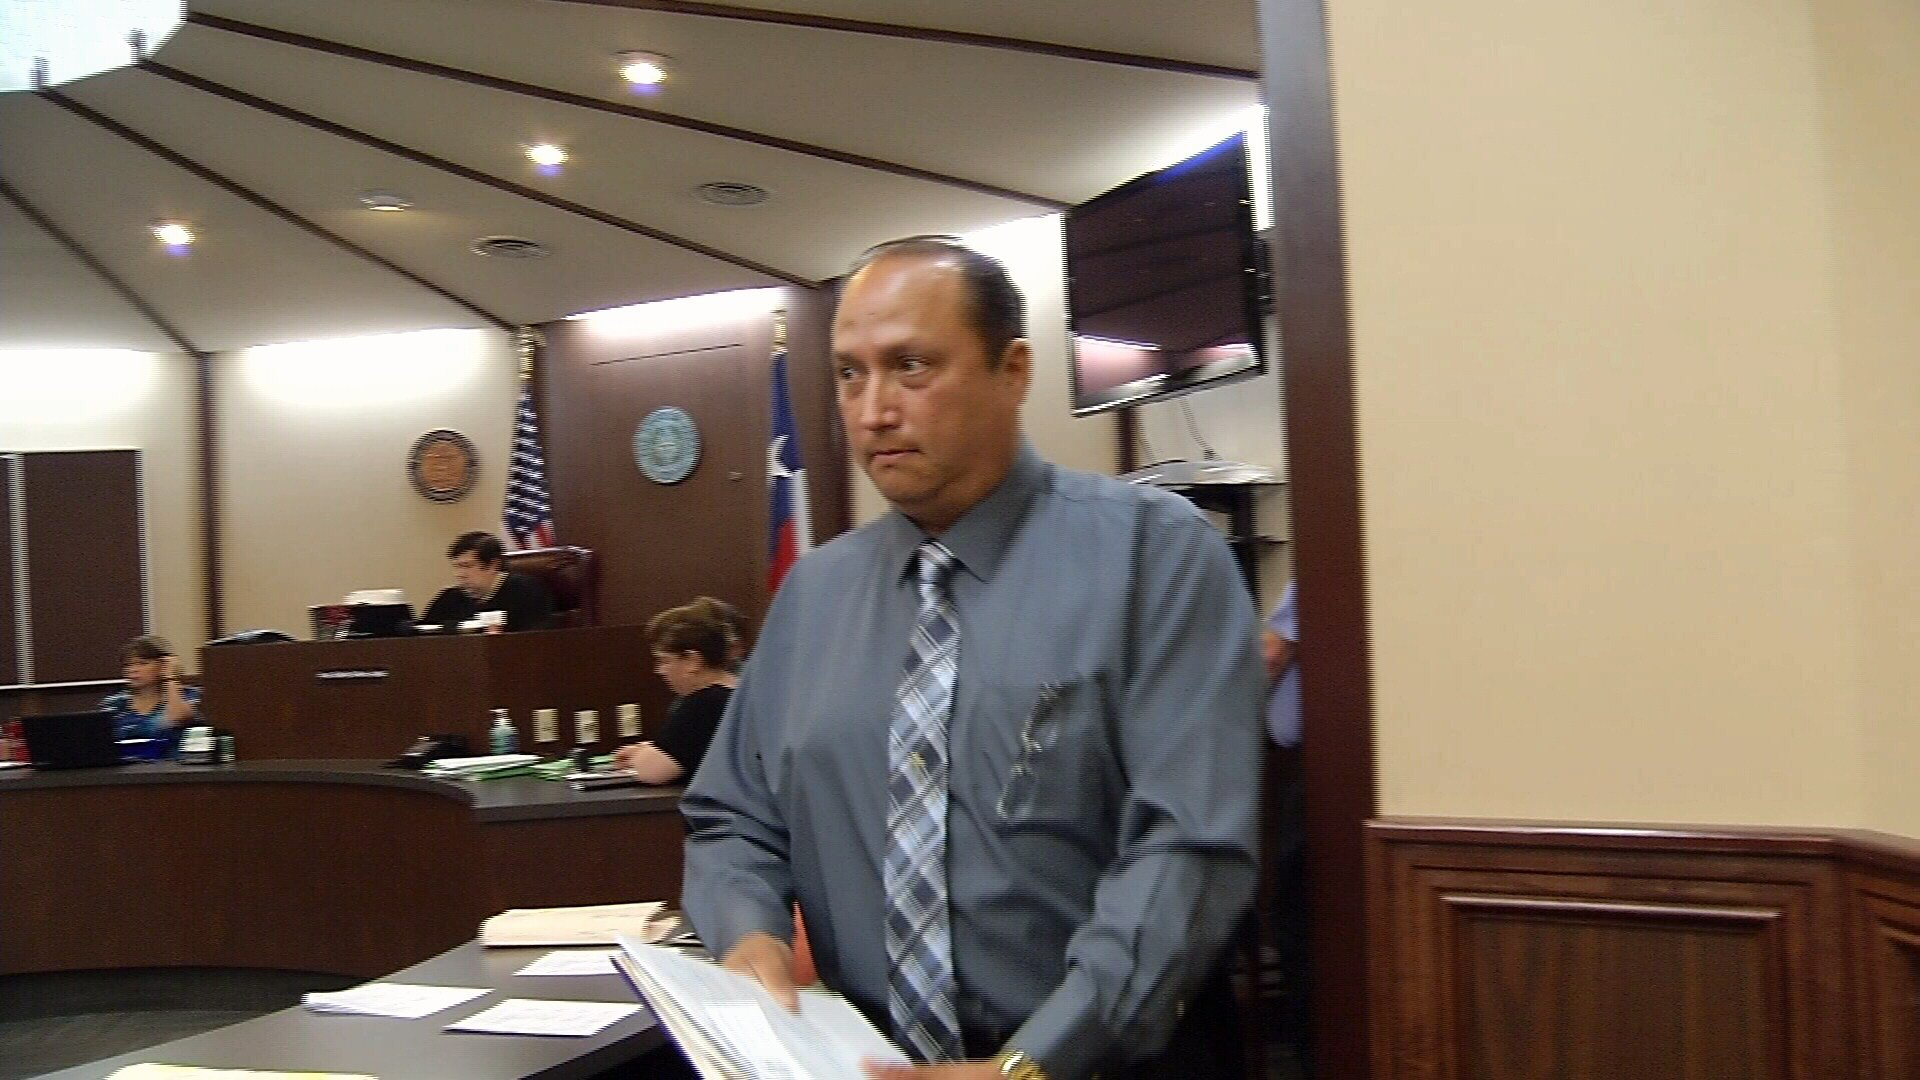 Rodrigo Hinojosa has served 2 and a half years of his 10 year probation sentence.